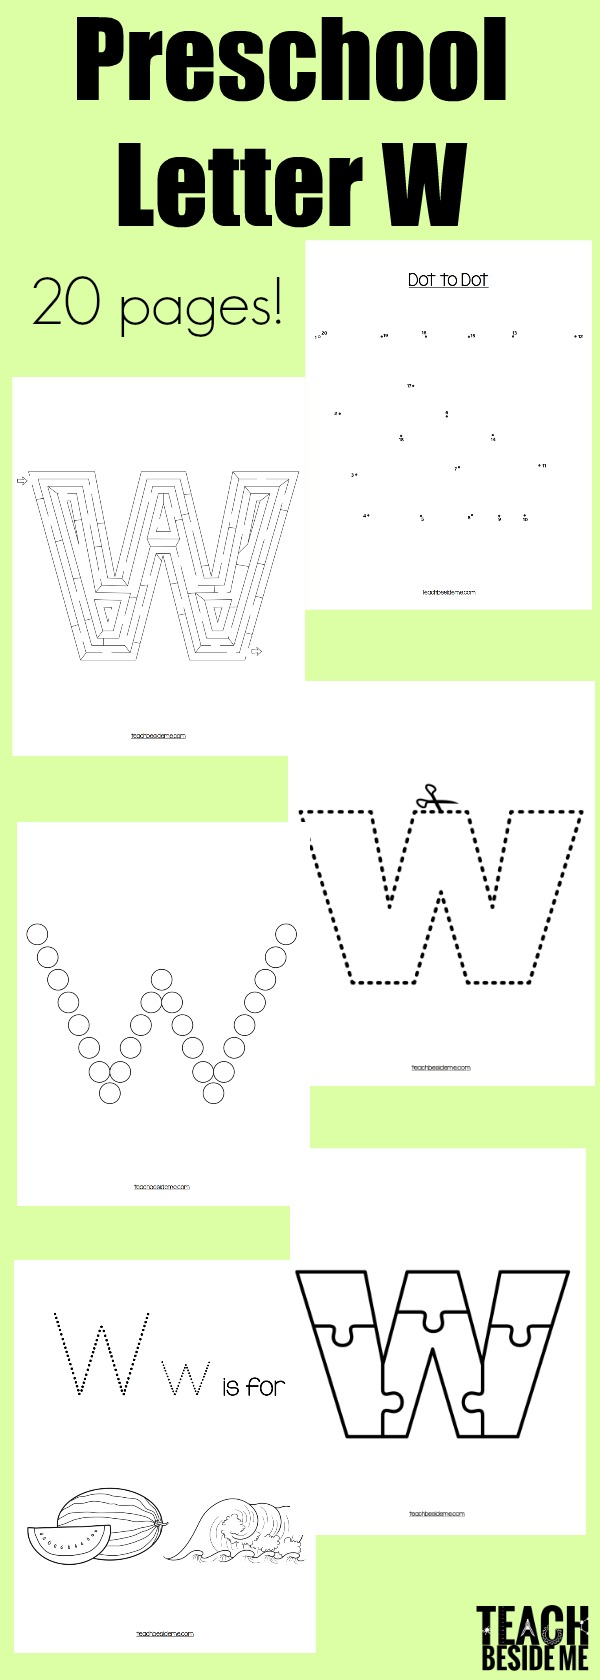 Preschool Letter W Activities and worksheets